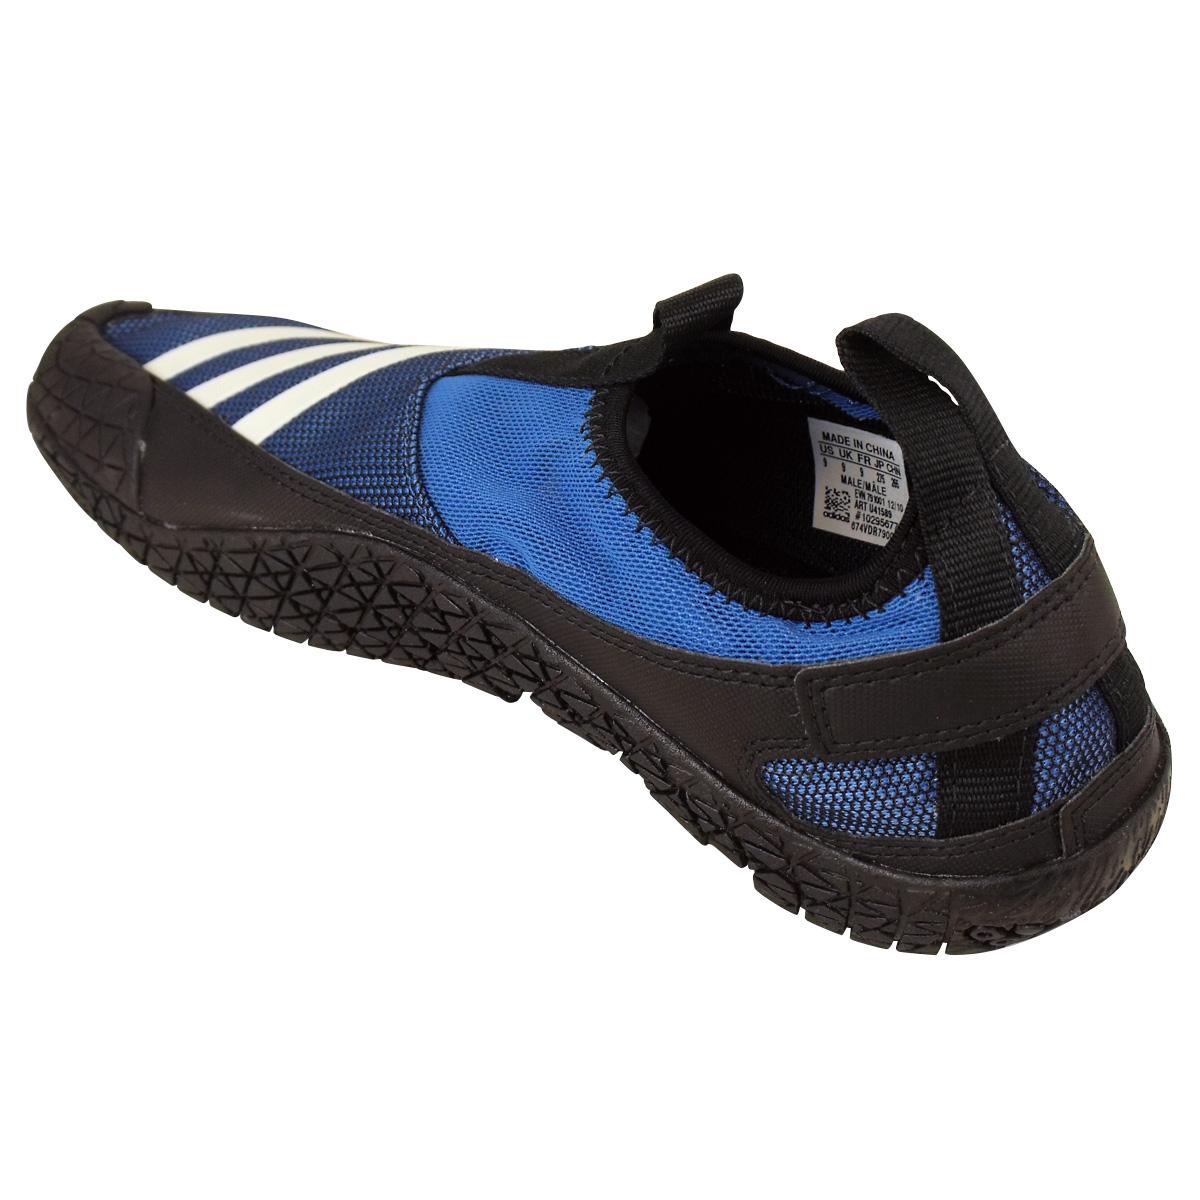 Mens Adidas Jawpaw II 2 Slip On Boat Water Pumps Shoes ...